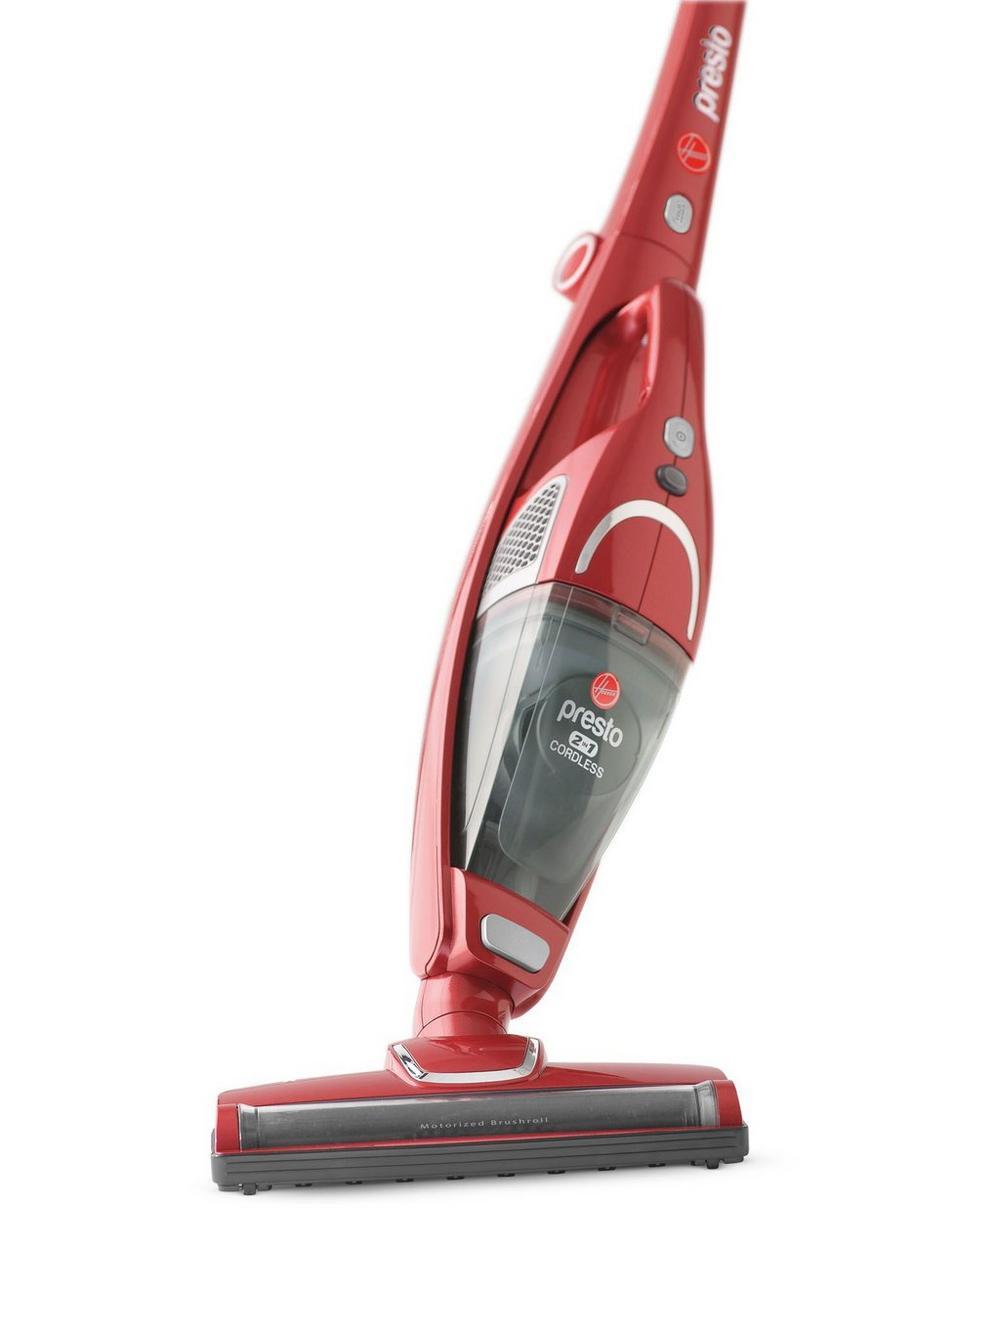 Reconditioned Presto 2-in-1 Cordless Stick Vacuum3